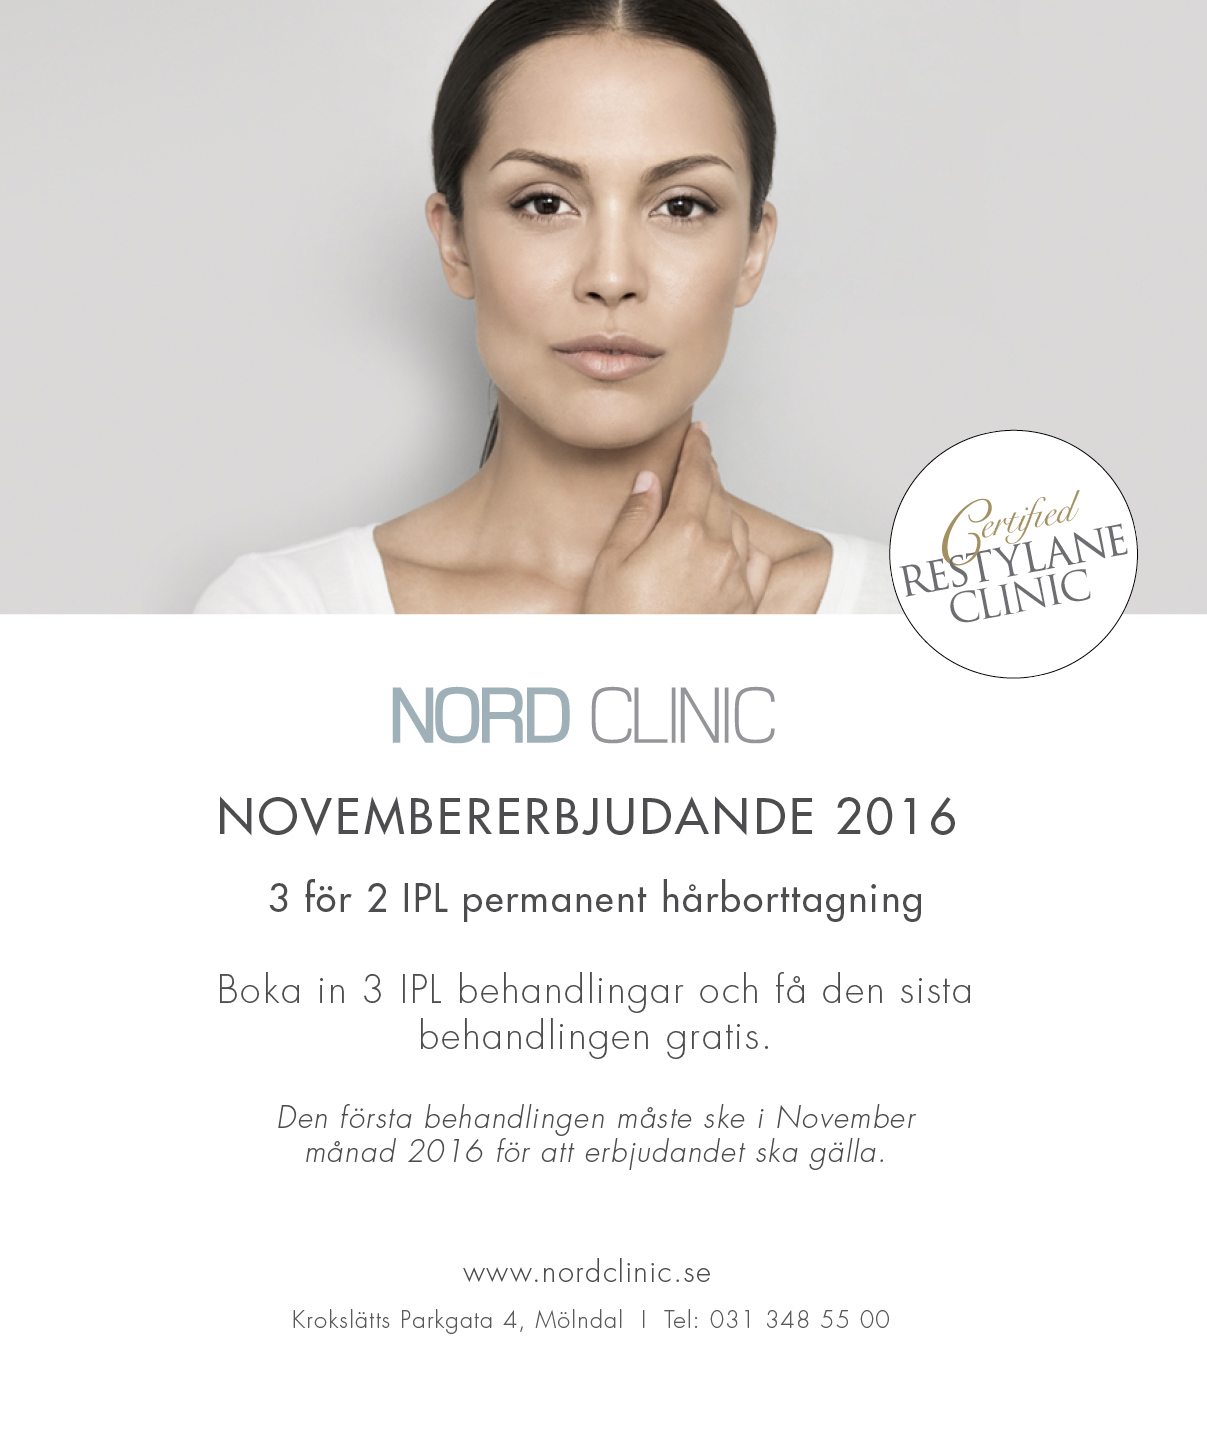 nord clinic mölndal